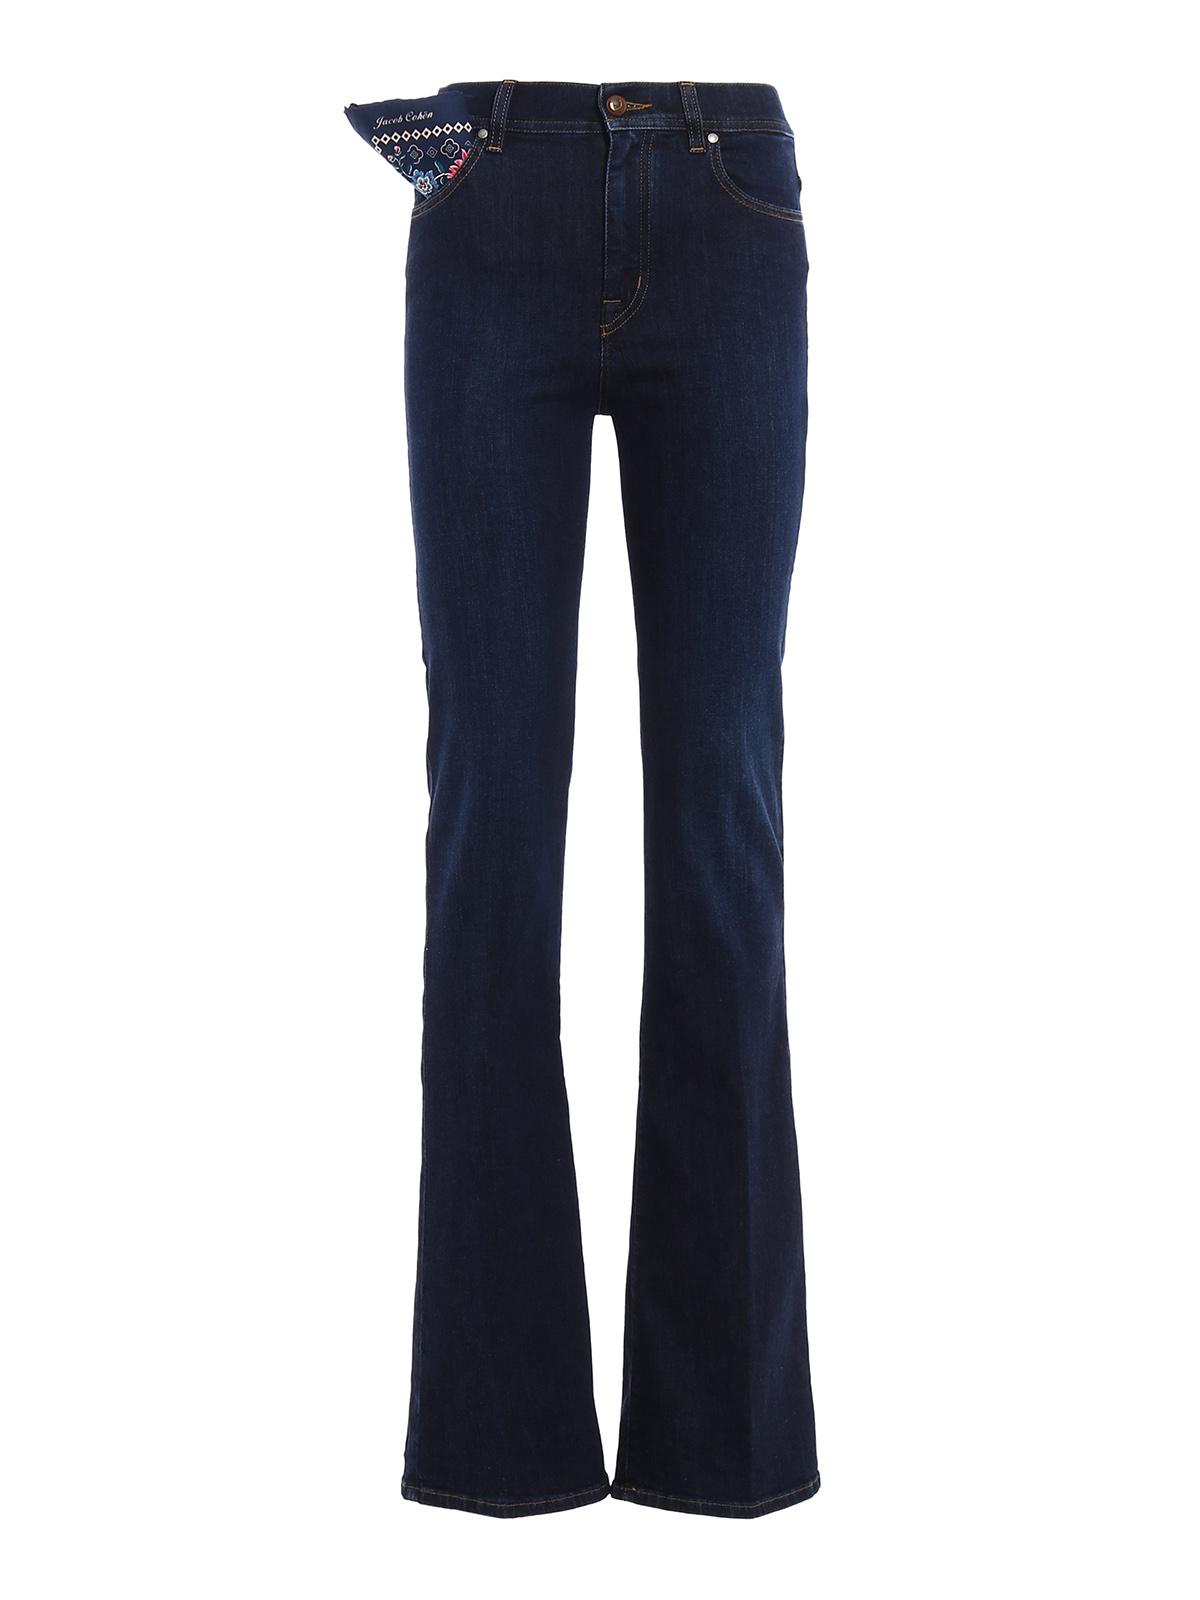 Linda high rise jeans by jacob cohen bootcut jeans ikrix - Jacob cohen denim ...